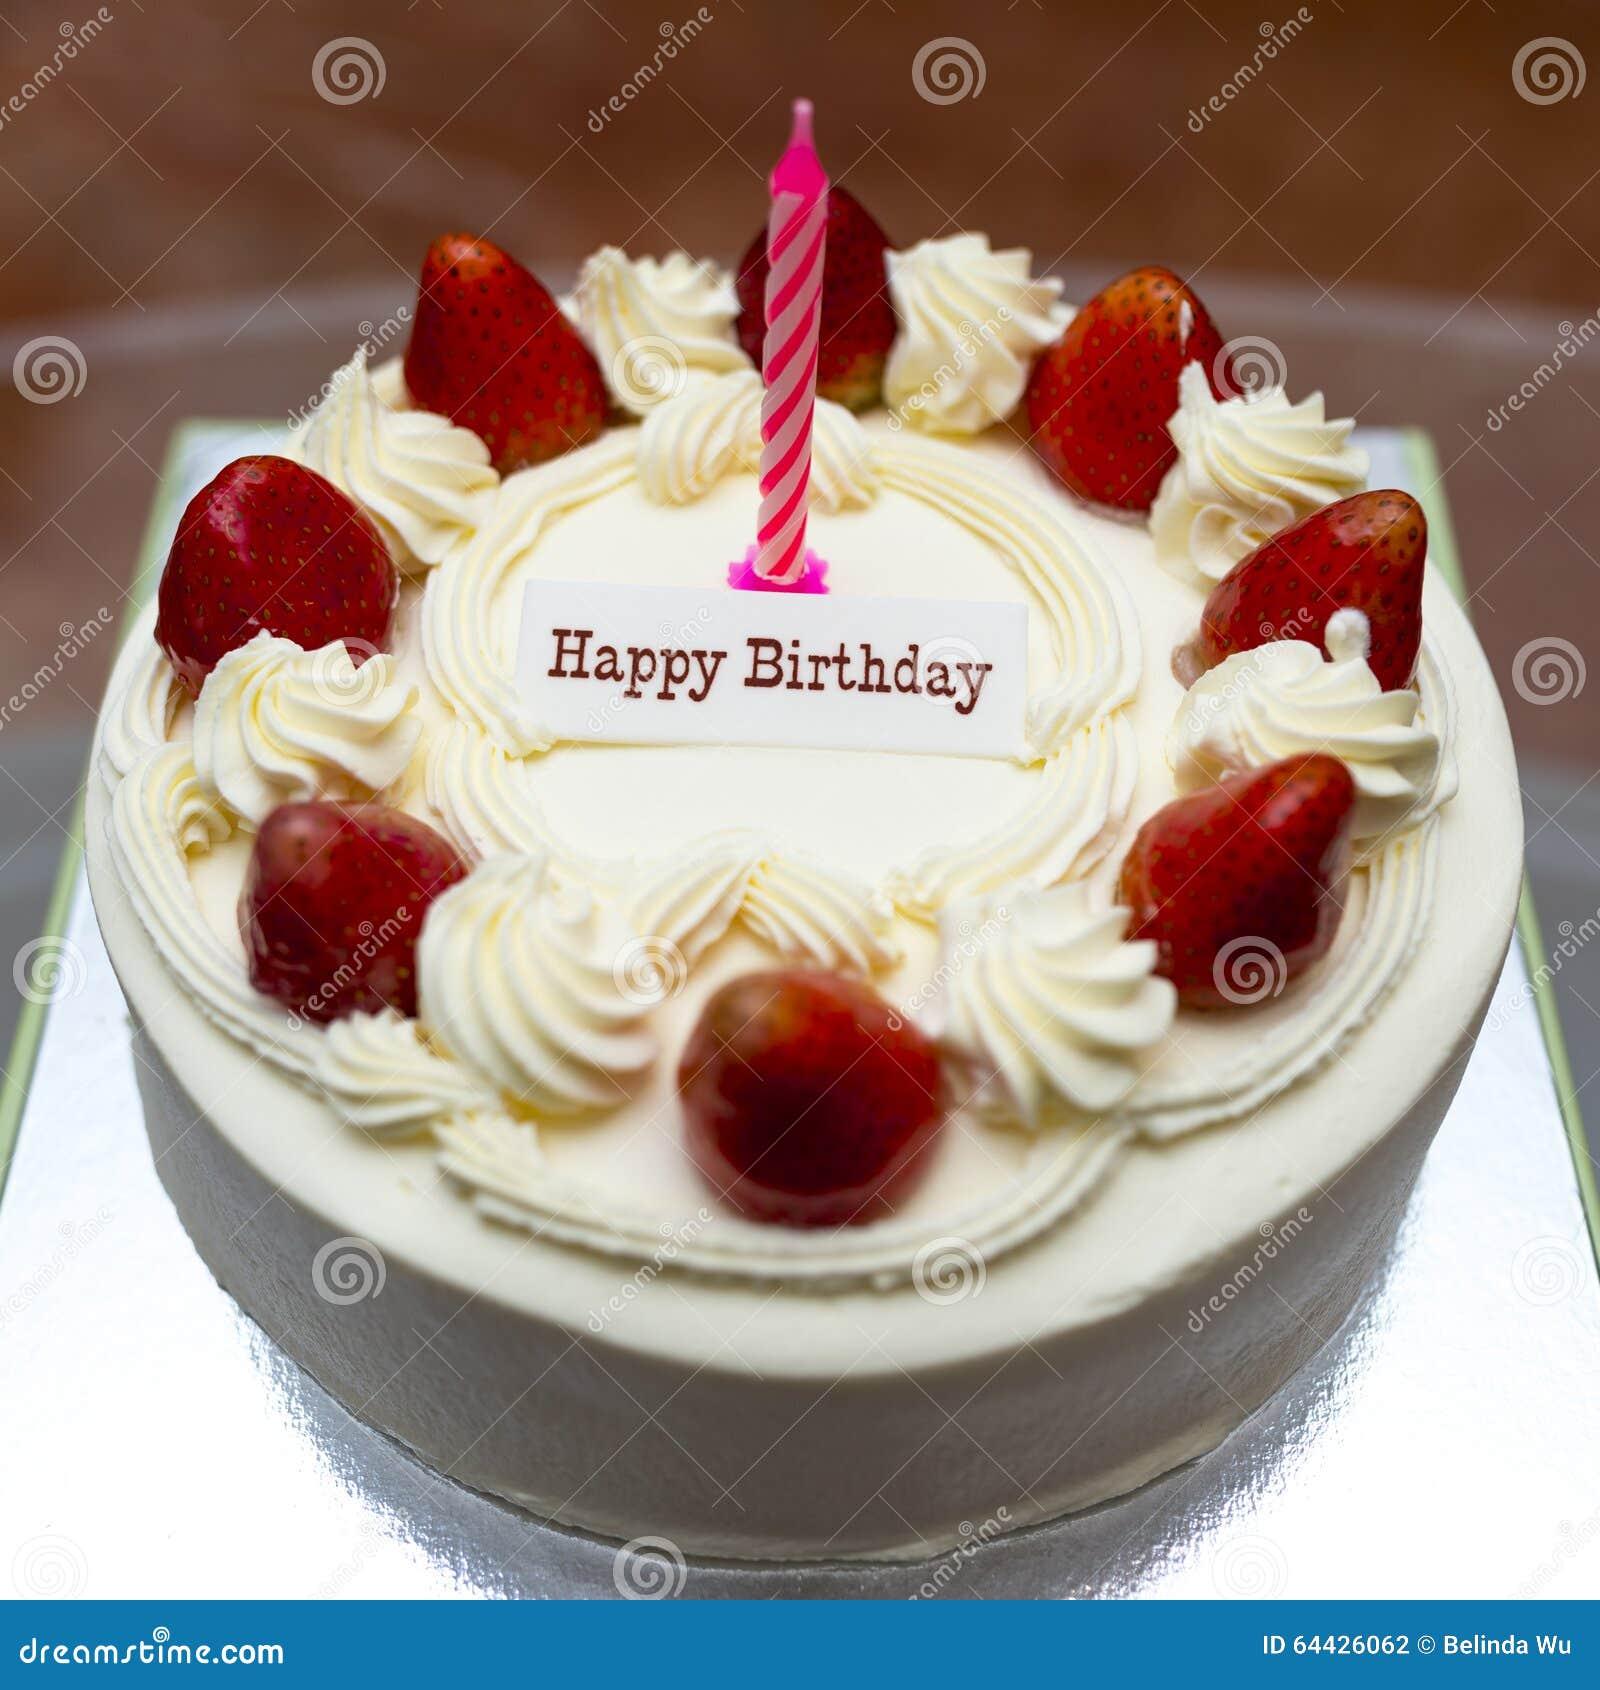 Outstanding Birthday Cake Stock Photo Image Of Cream Sweet Confectionary Personalised Birthday Cards Beptaeletsinfo